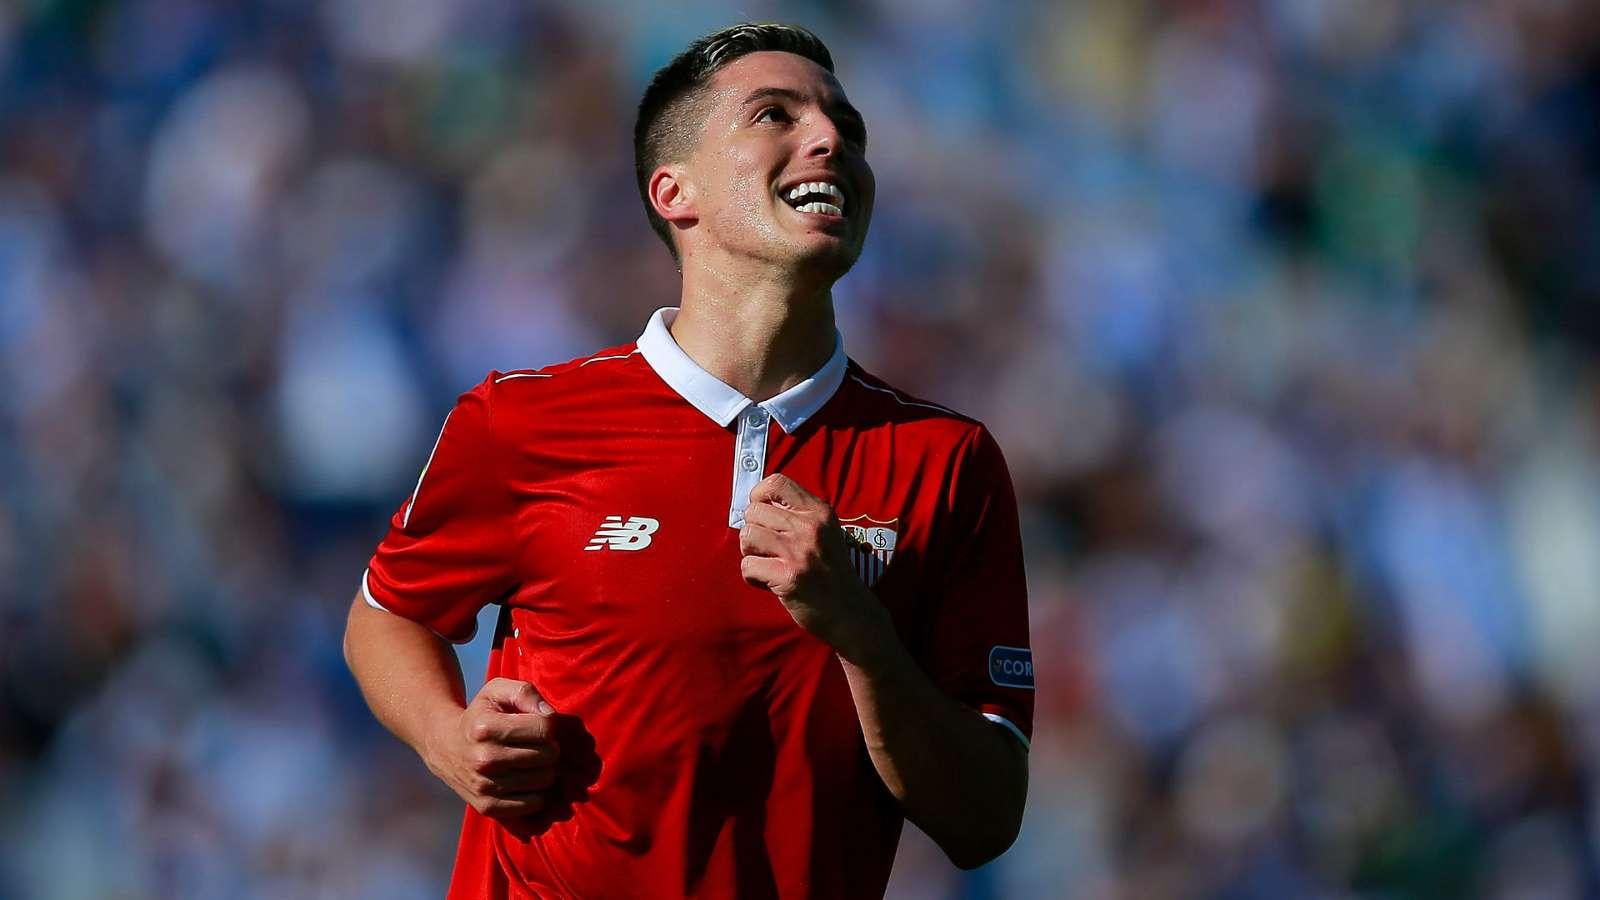 Samir Nasri Mau Gabung Sevilla Karena Bebas Mabuk & Pergi Ke Klub Malam